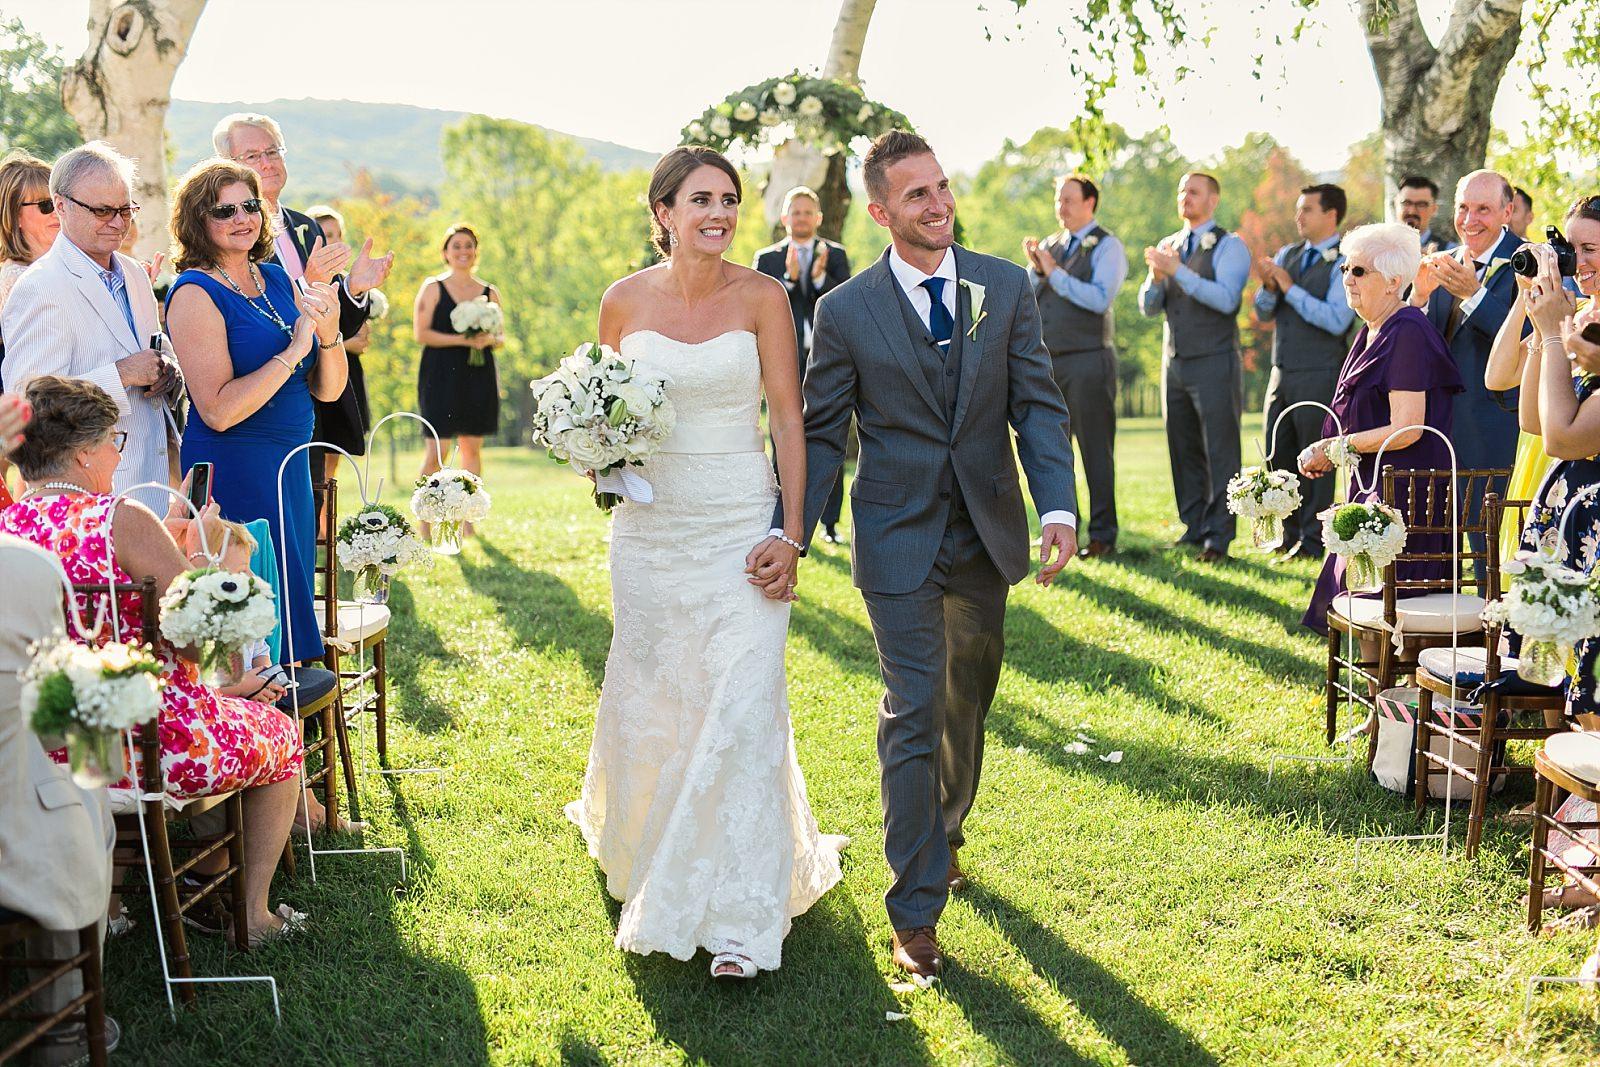 CT_Wedding_Photographer_LiNa_Wed_49.jpg